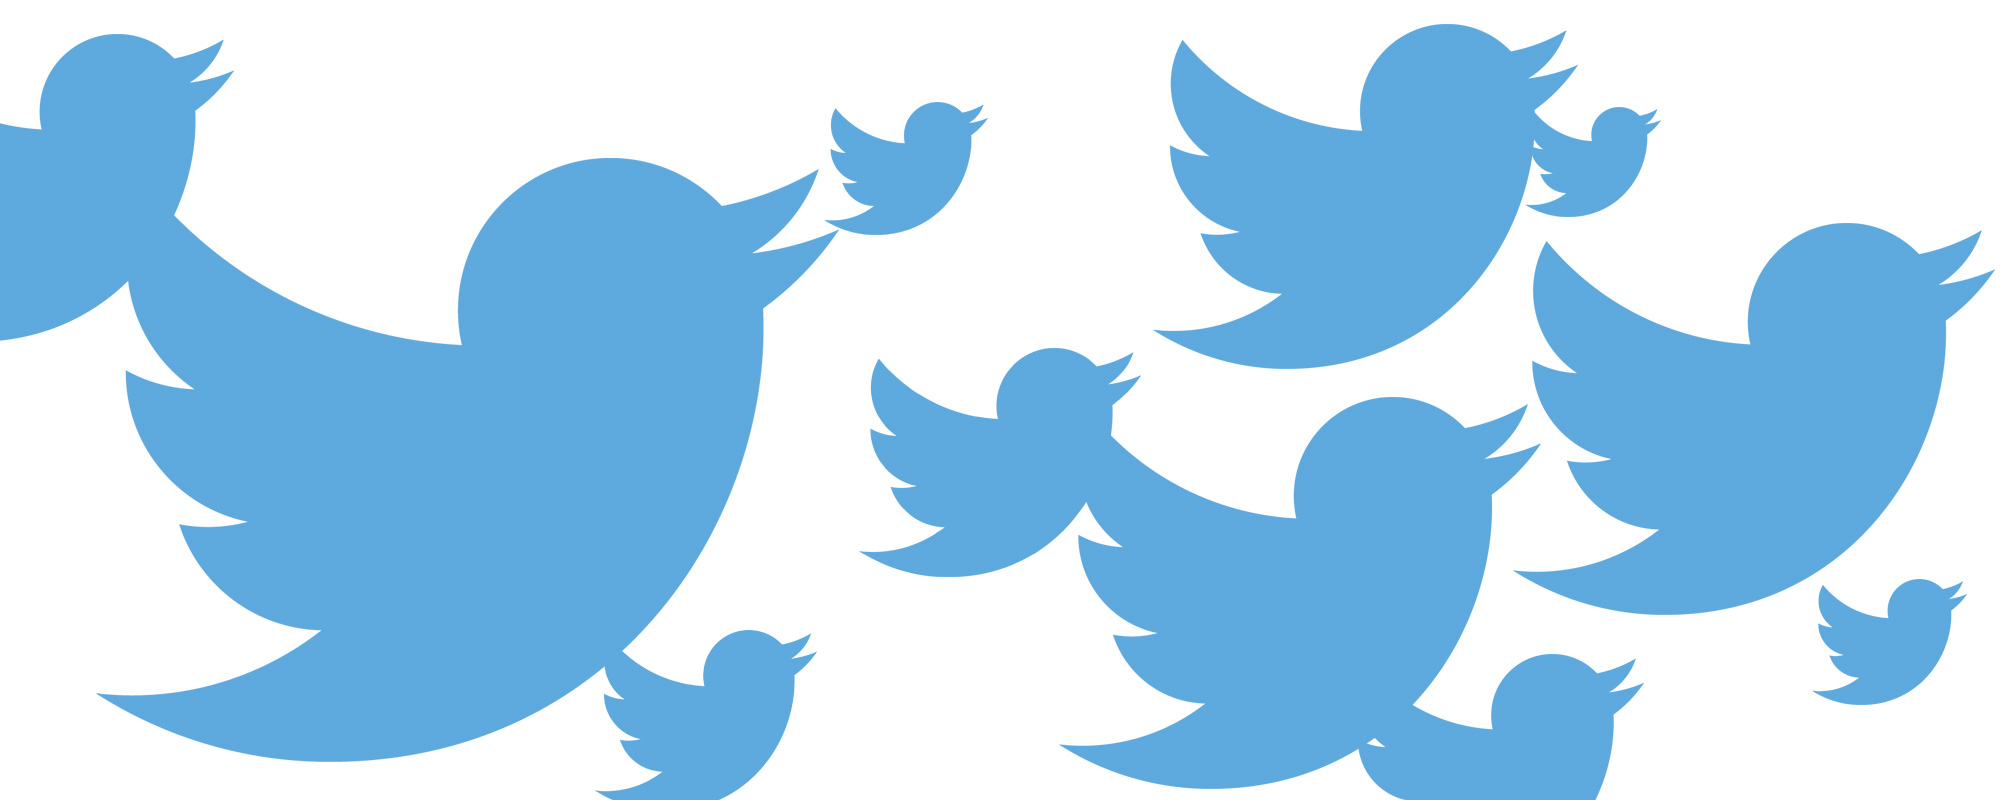 150000 seguidores en Twitter ¡Gracias!